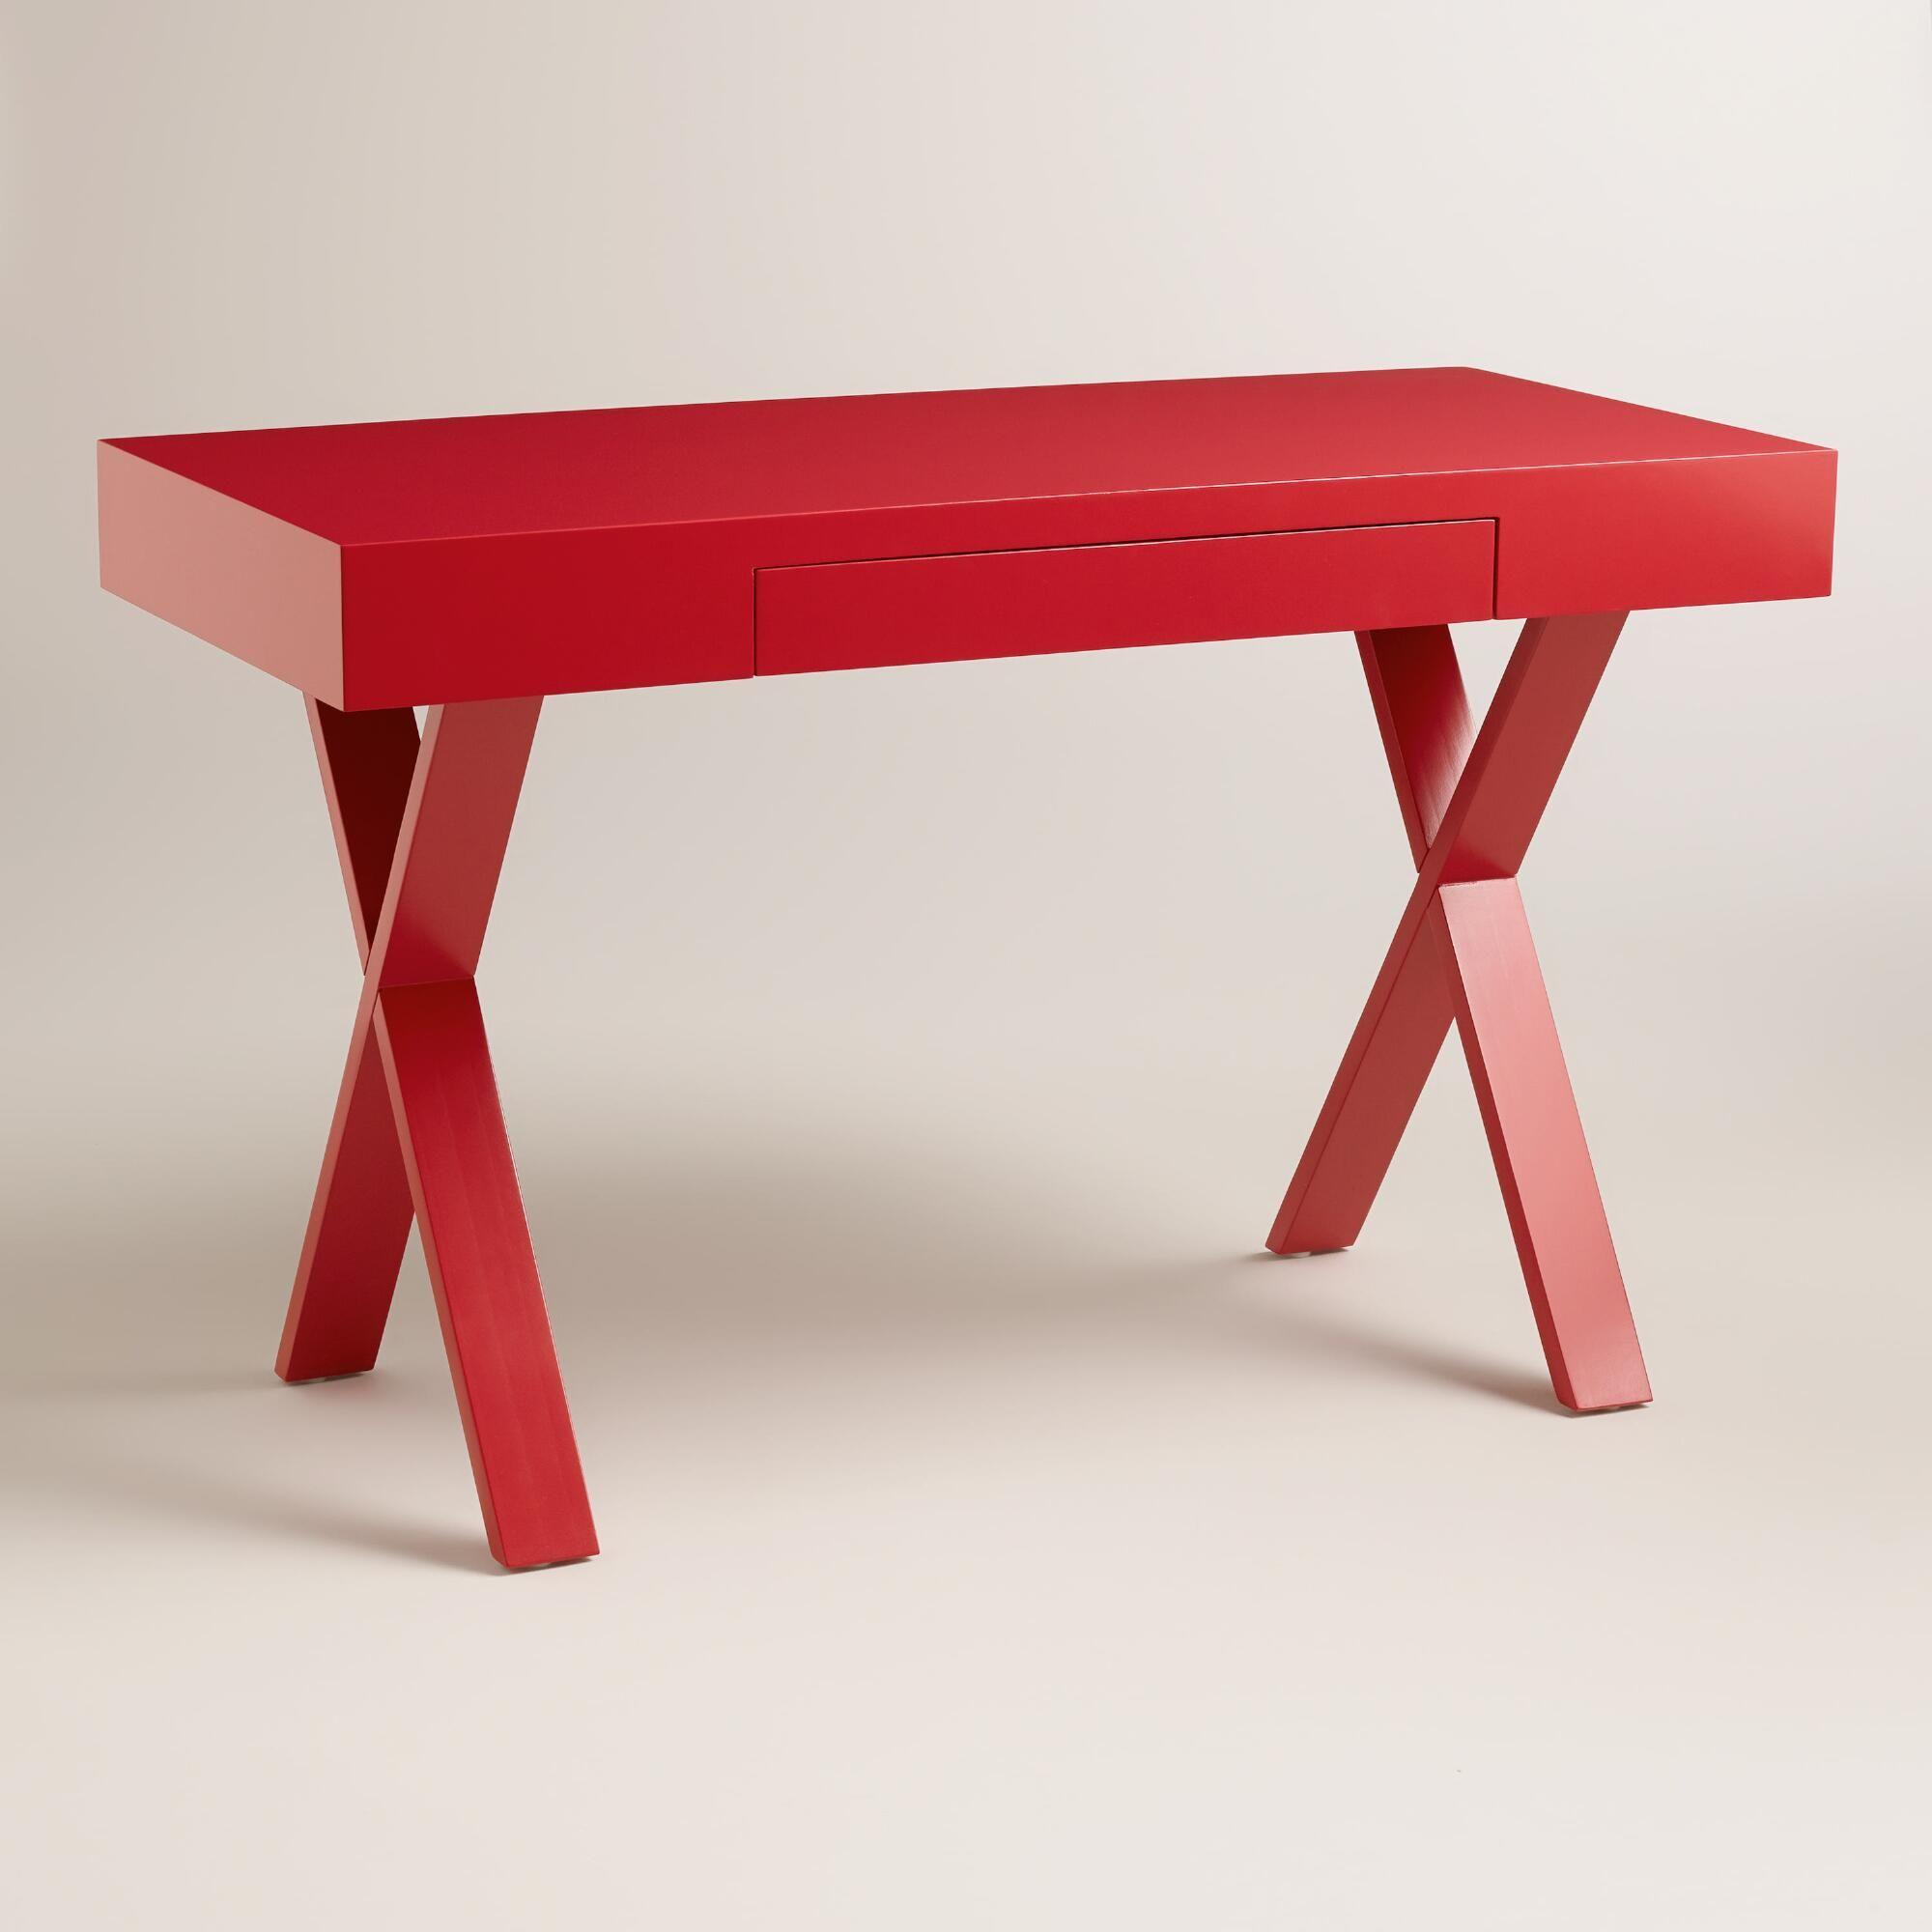 Peachy Red Josephine Desk World Market Den Office Green Desk Download Free Architecture Designs Embacsunscenecom